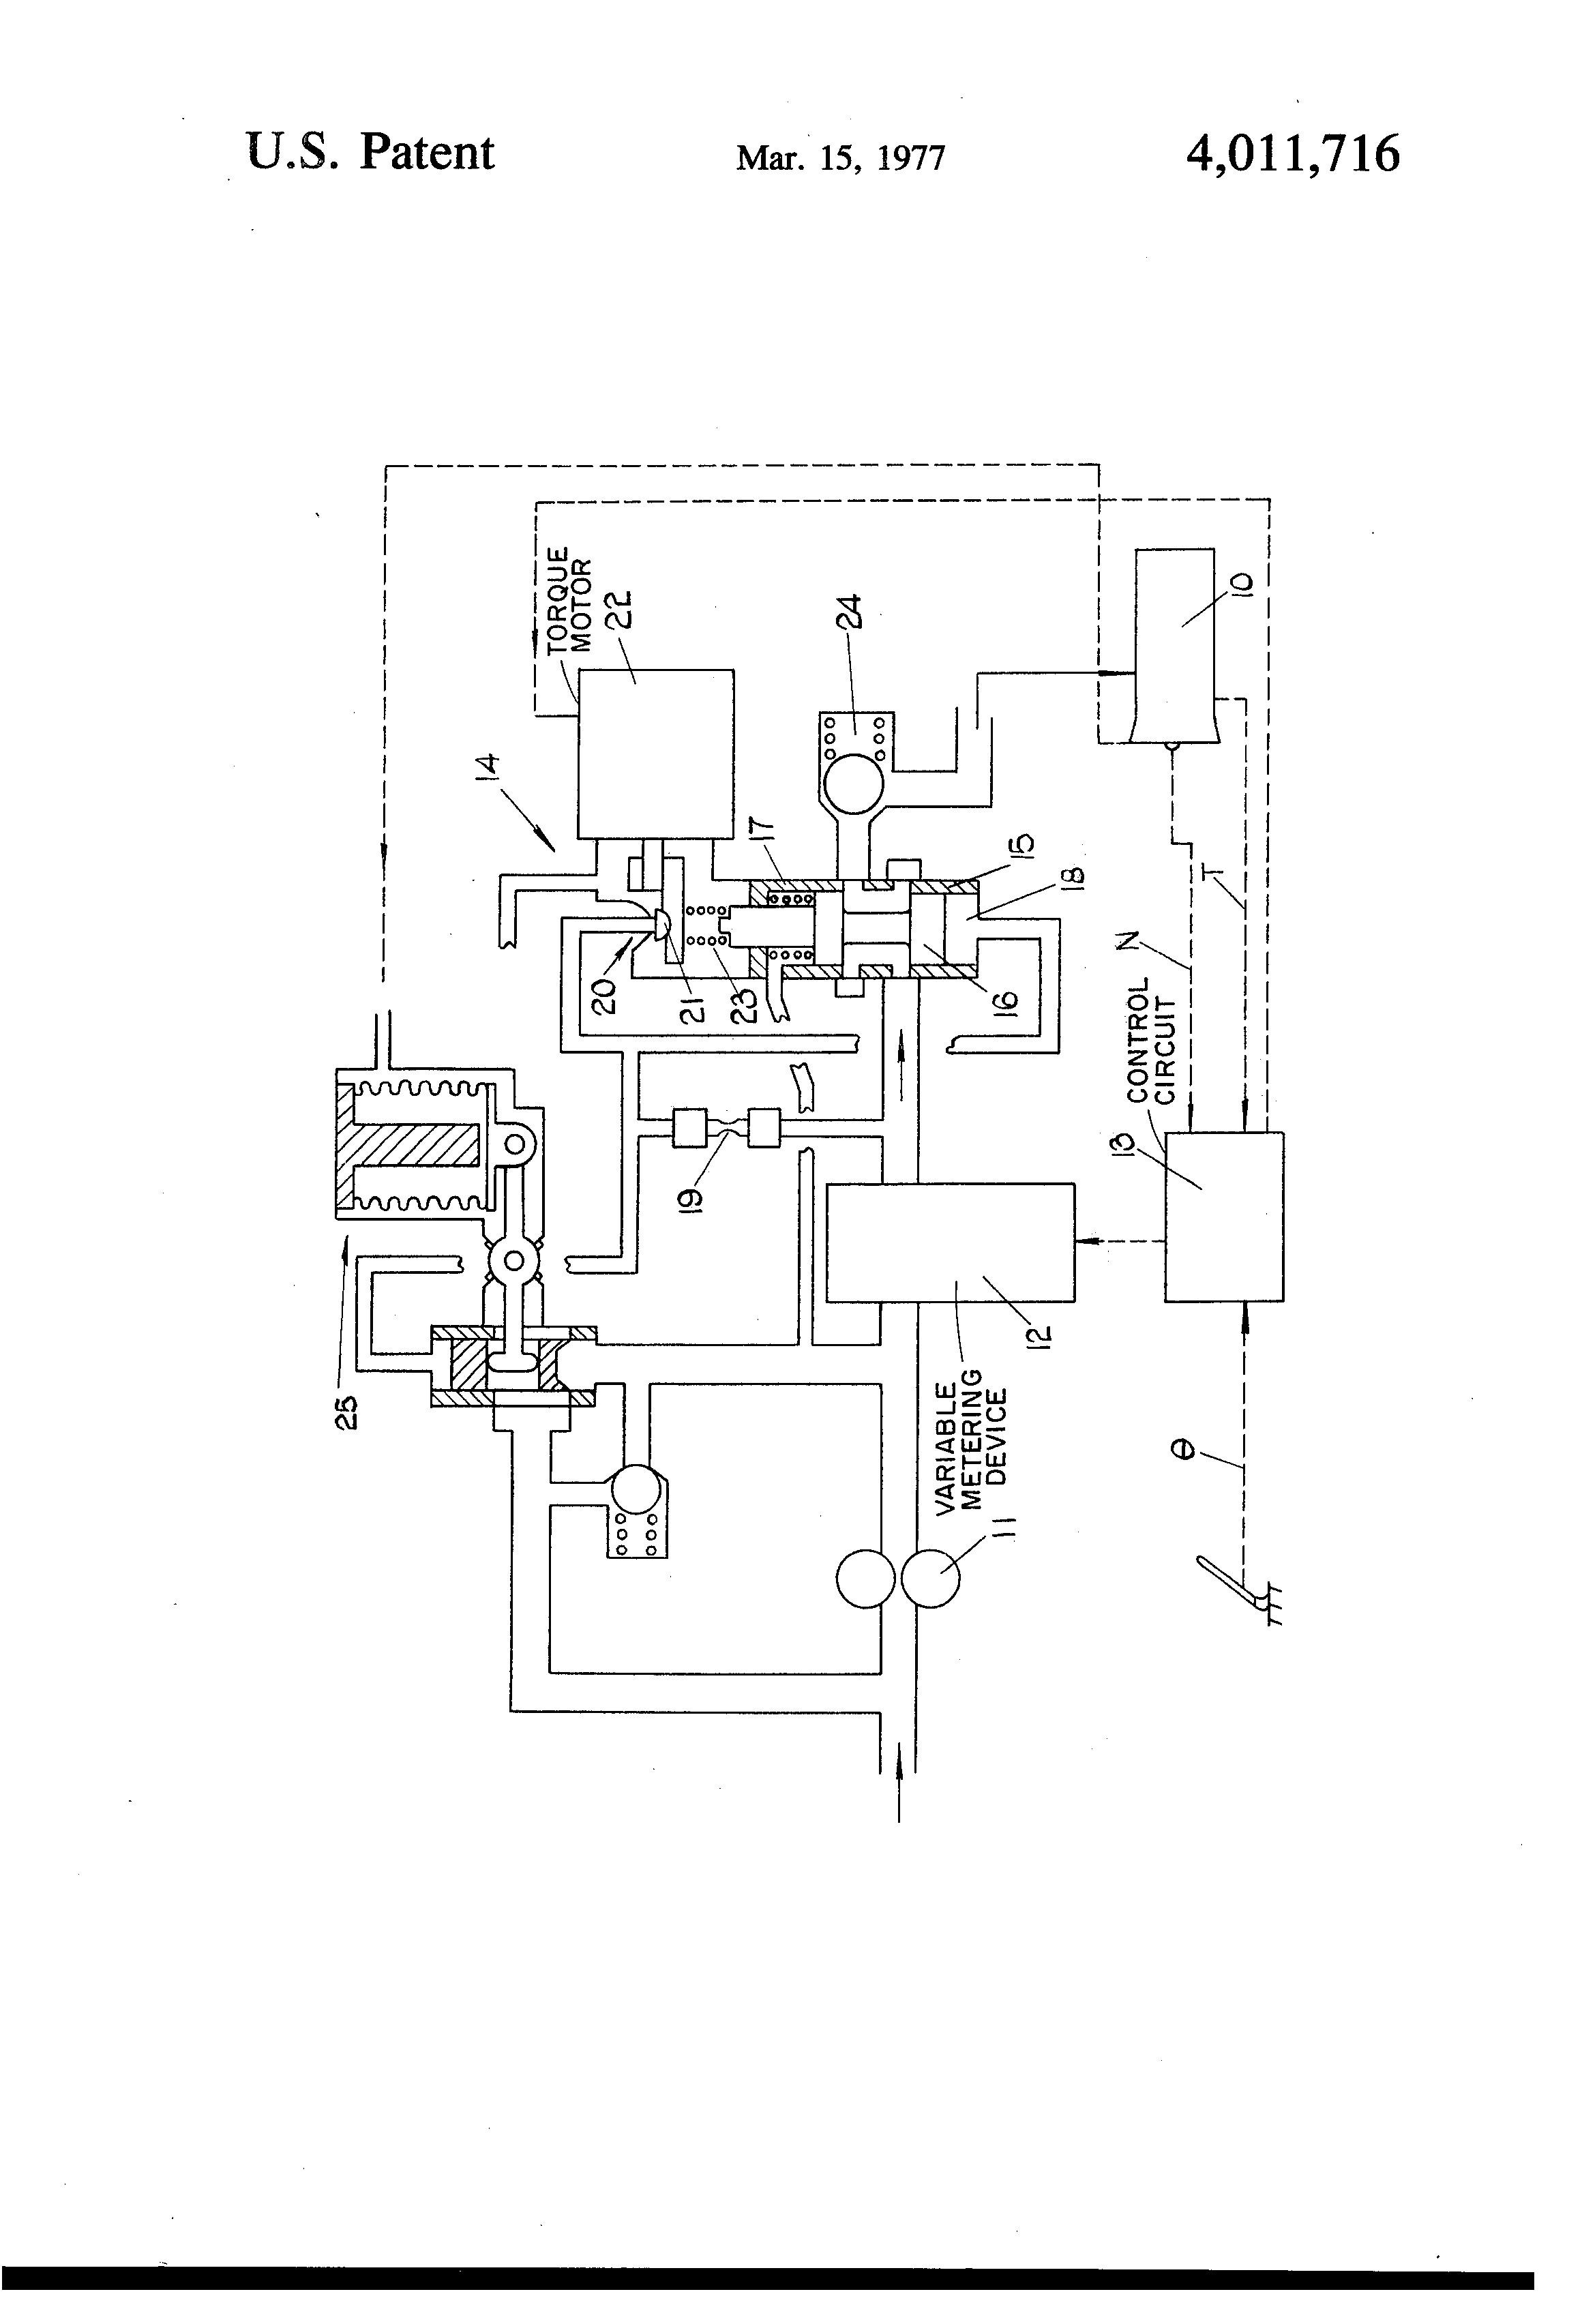 gas turbine engine diagram patent us fuel control system